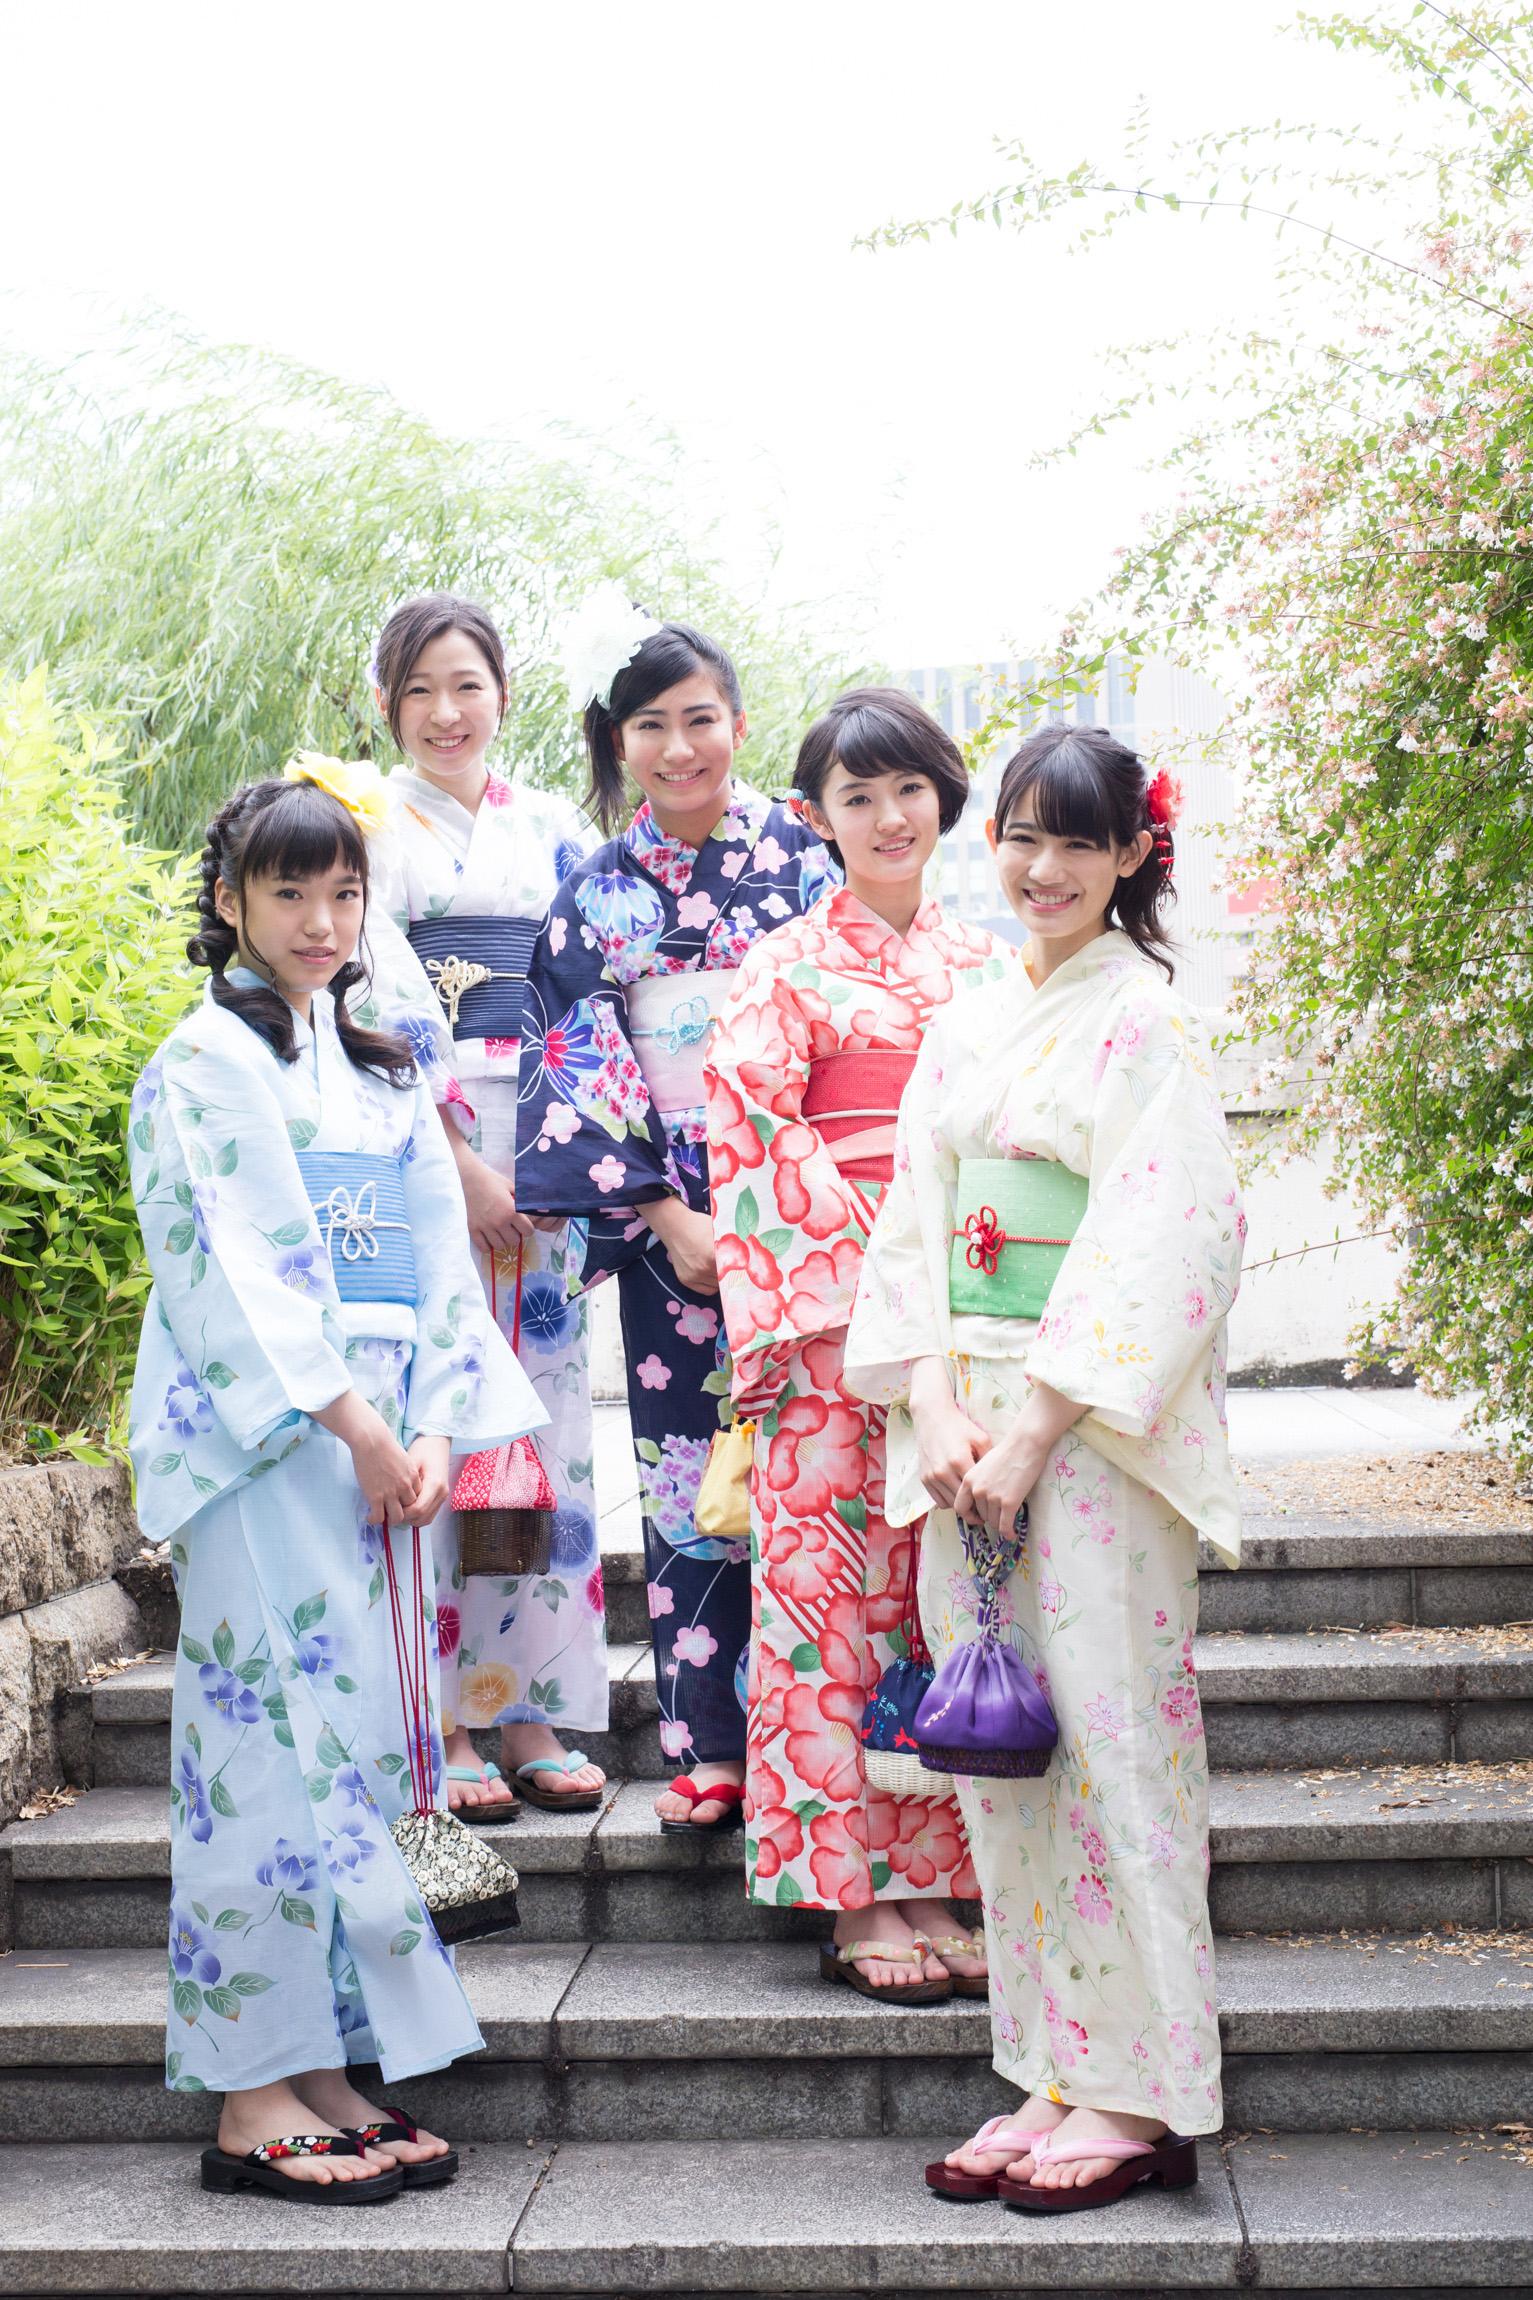 20160831_teamsyachihoko02_offshot_toukou